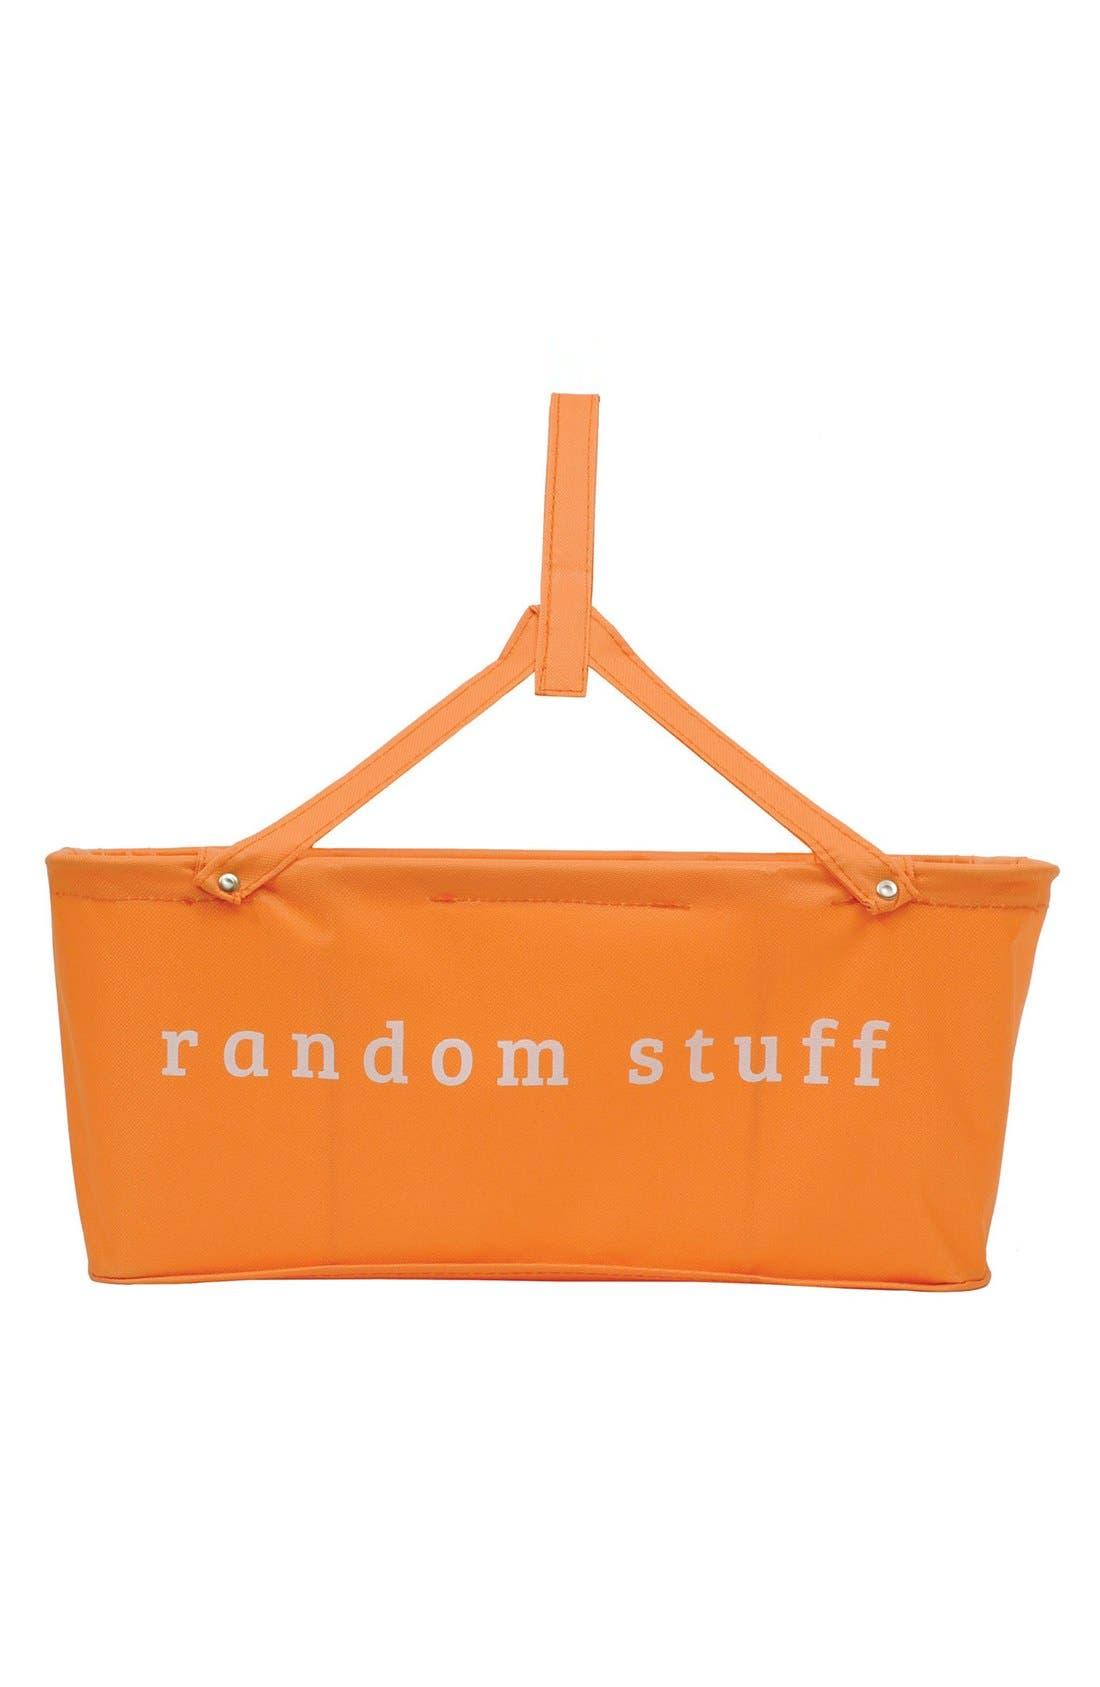 Alternate Image 1 Selected - Creative Co-Op 'Random Stuff' Canvas Basket